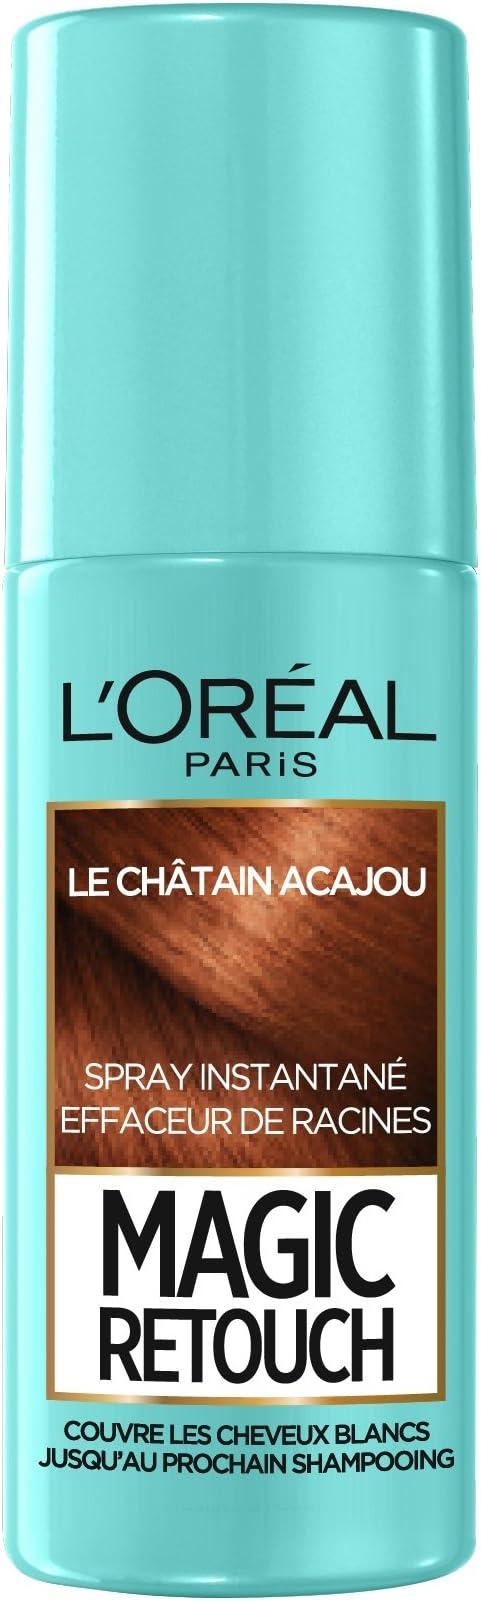 Spray Magic Retouch para retoque de raíz instantáneo, castaño, 75 ml, de L Oréal Paris